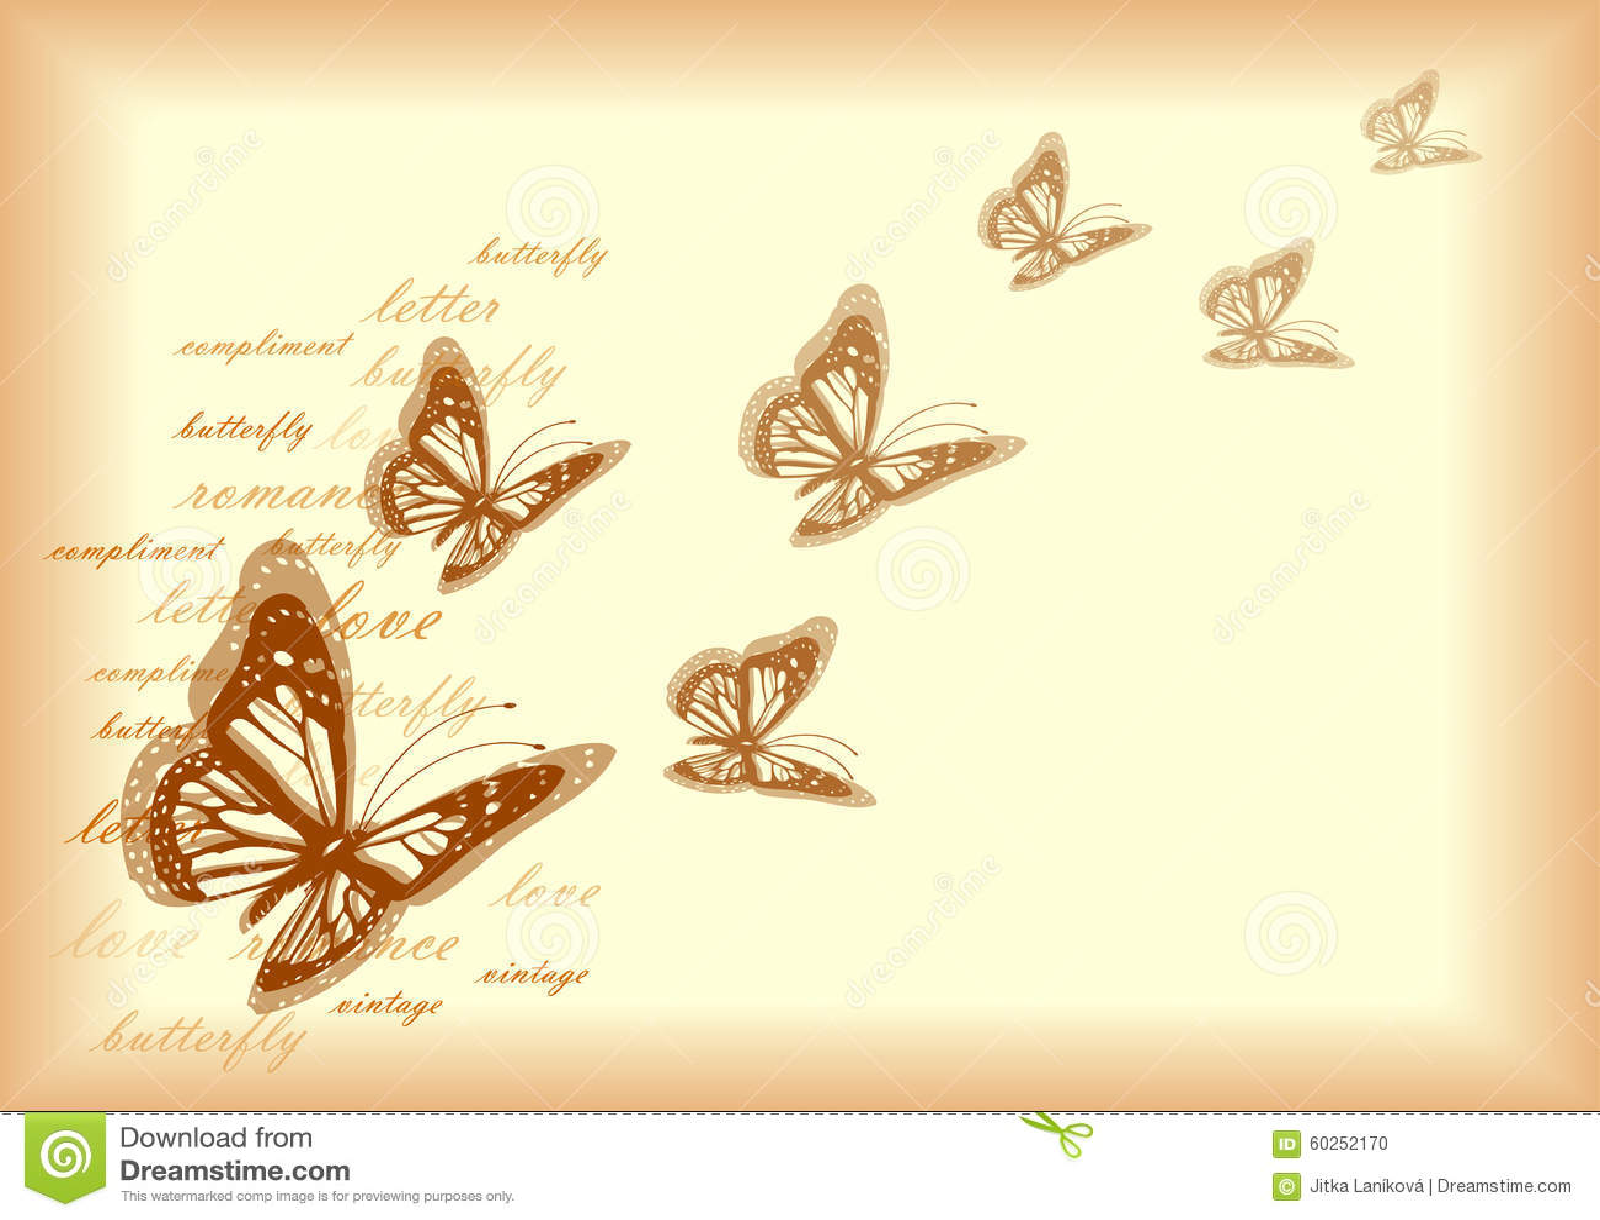 Vintage paper butterflies 87